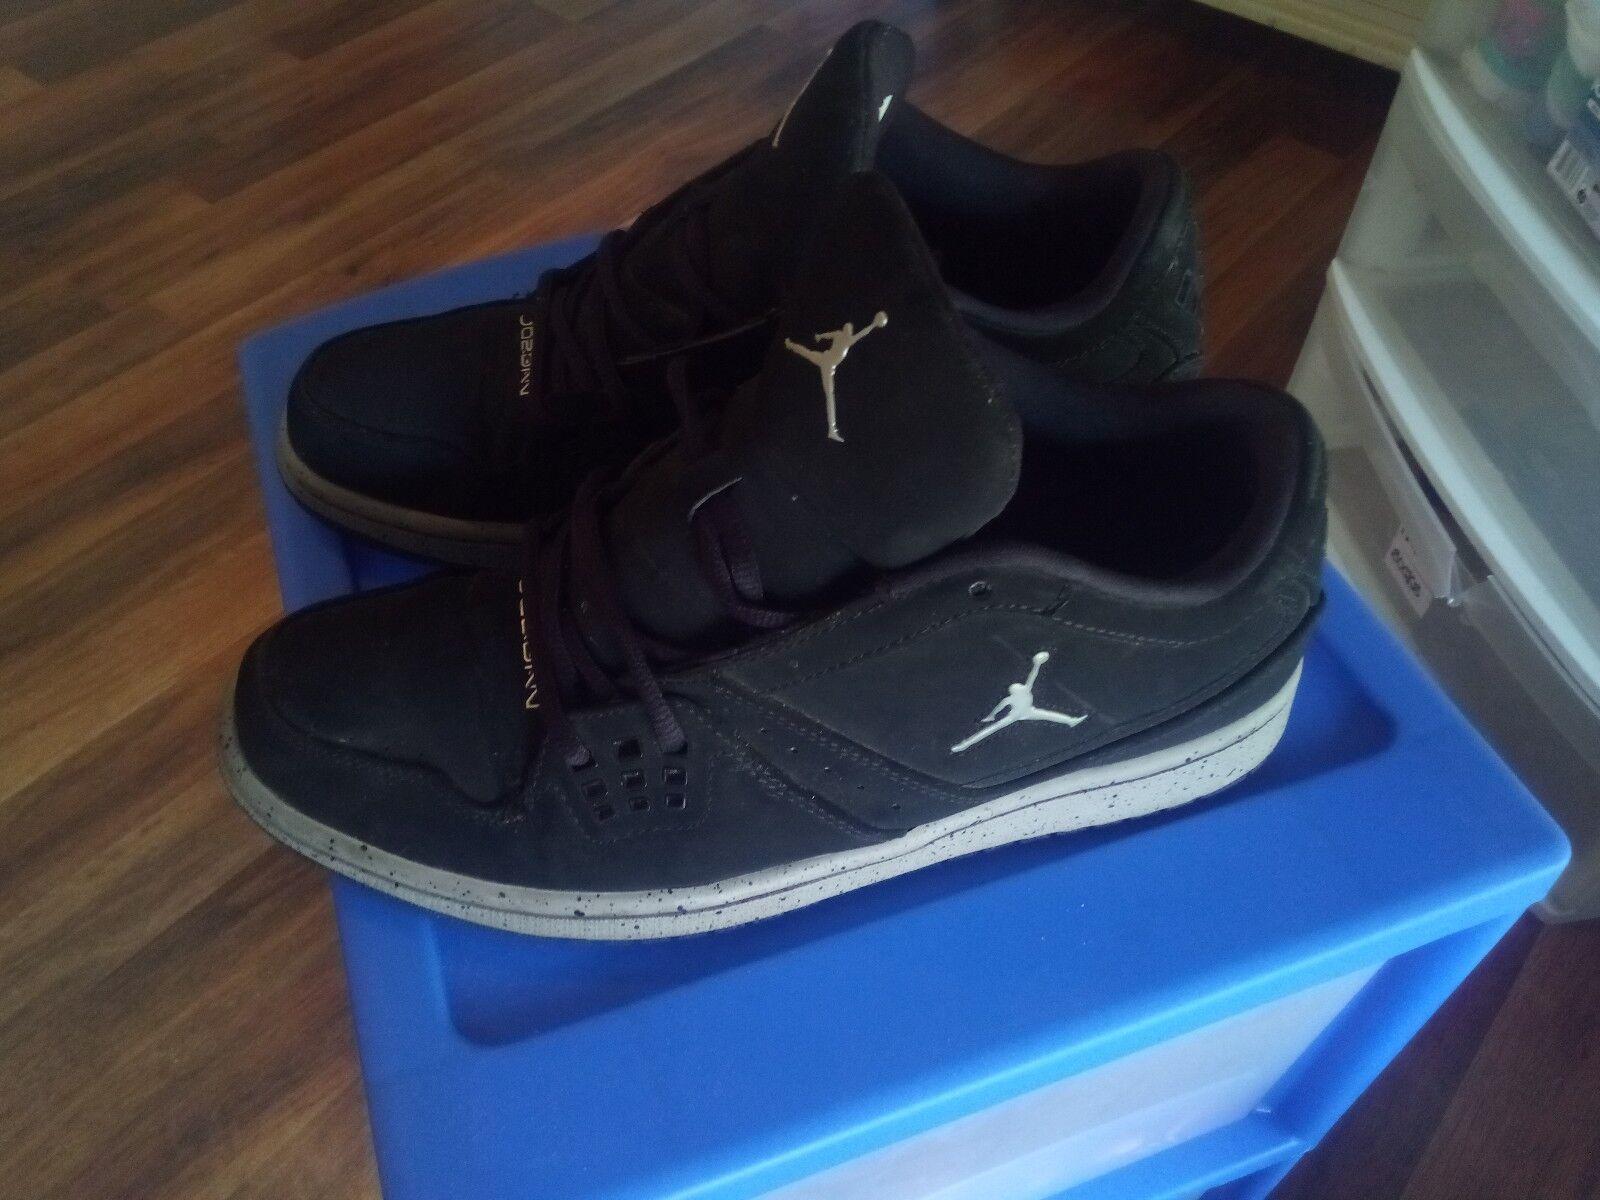 Nike Air Jordan Retro Men's shoes Size 10 Black Grey Discontinued.